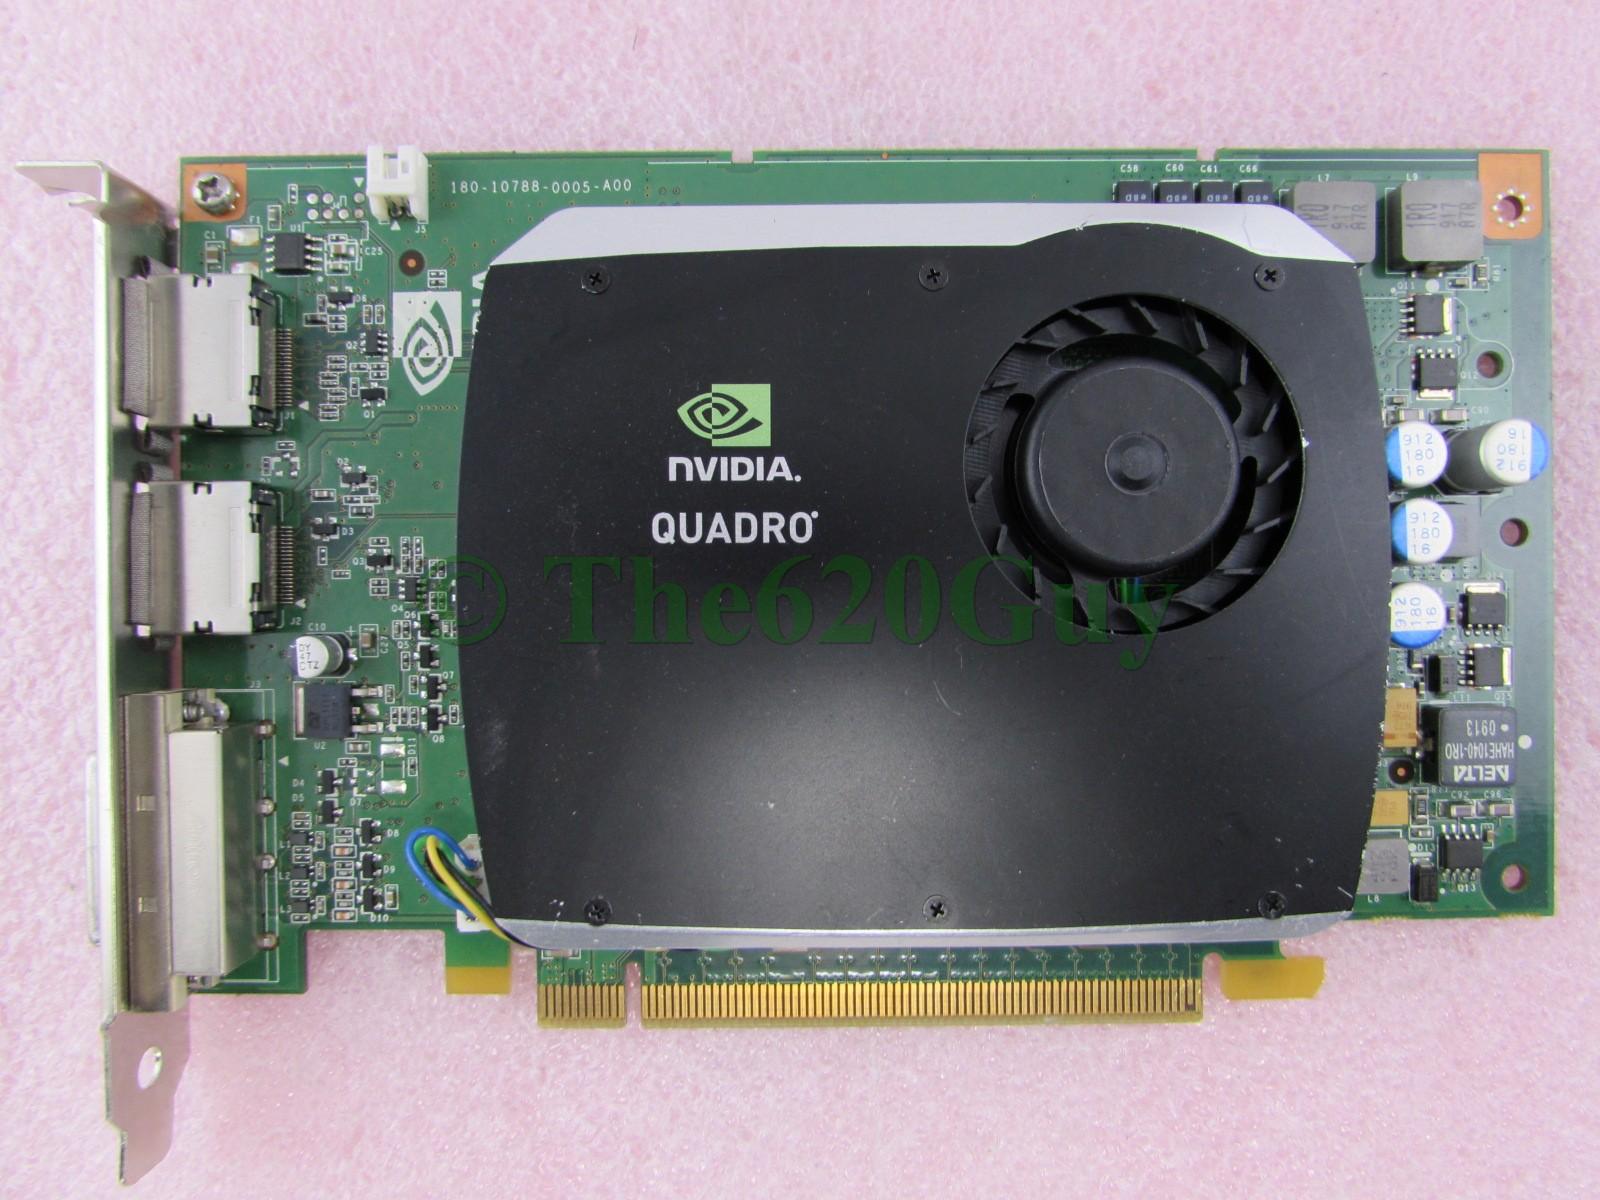 Nvidia Quadro Fx 580 Driverbrownface